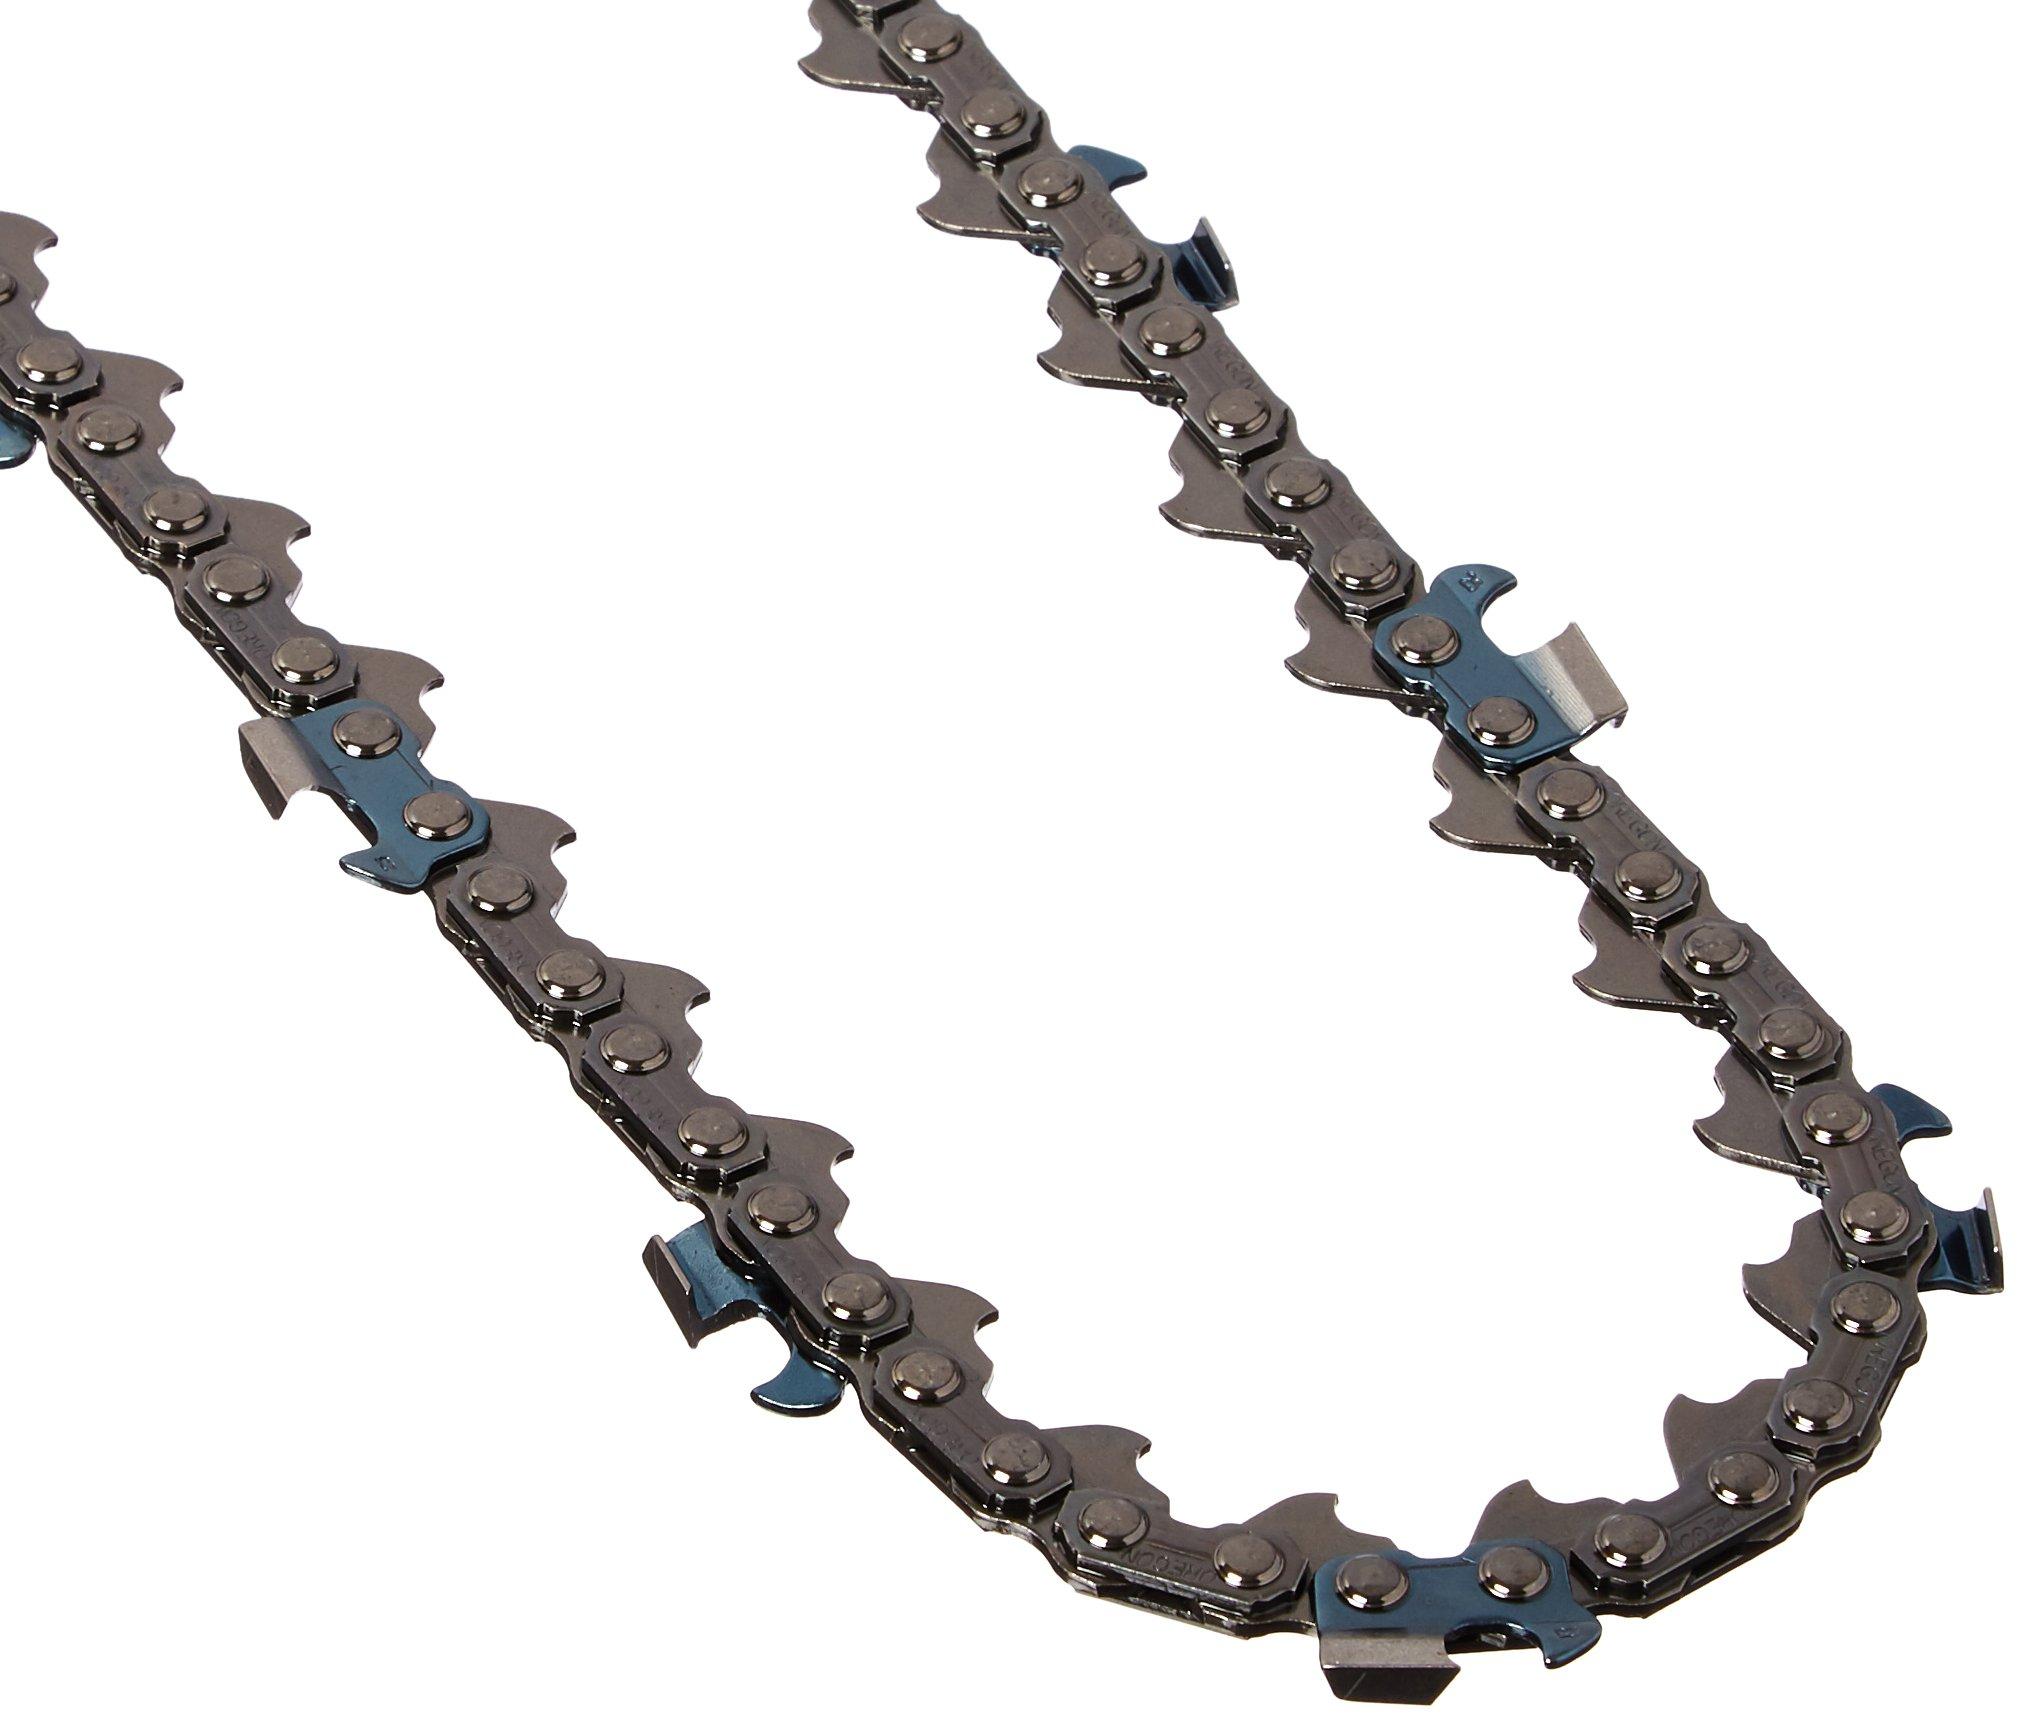 OREGON 72JGX072G 72 Drive Link Super Guard Skip Sequence Chain, 3/8-Inch by Oregon